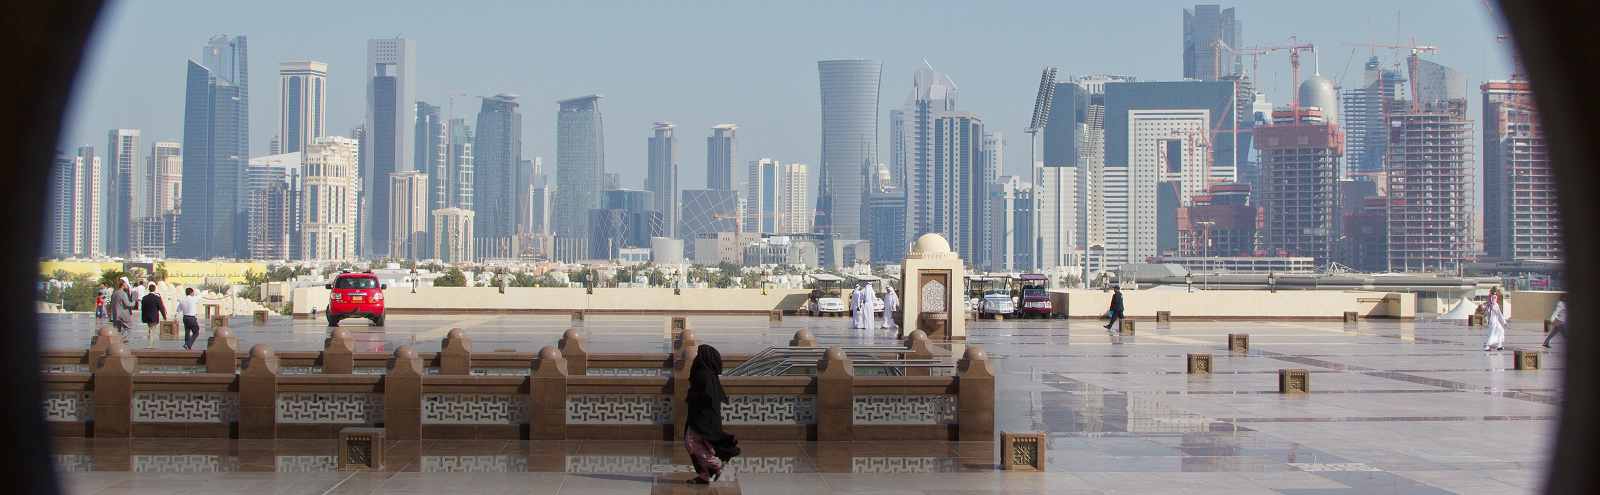 Doha skyline (Photo:Flickr/Omar Chatriwala)